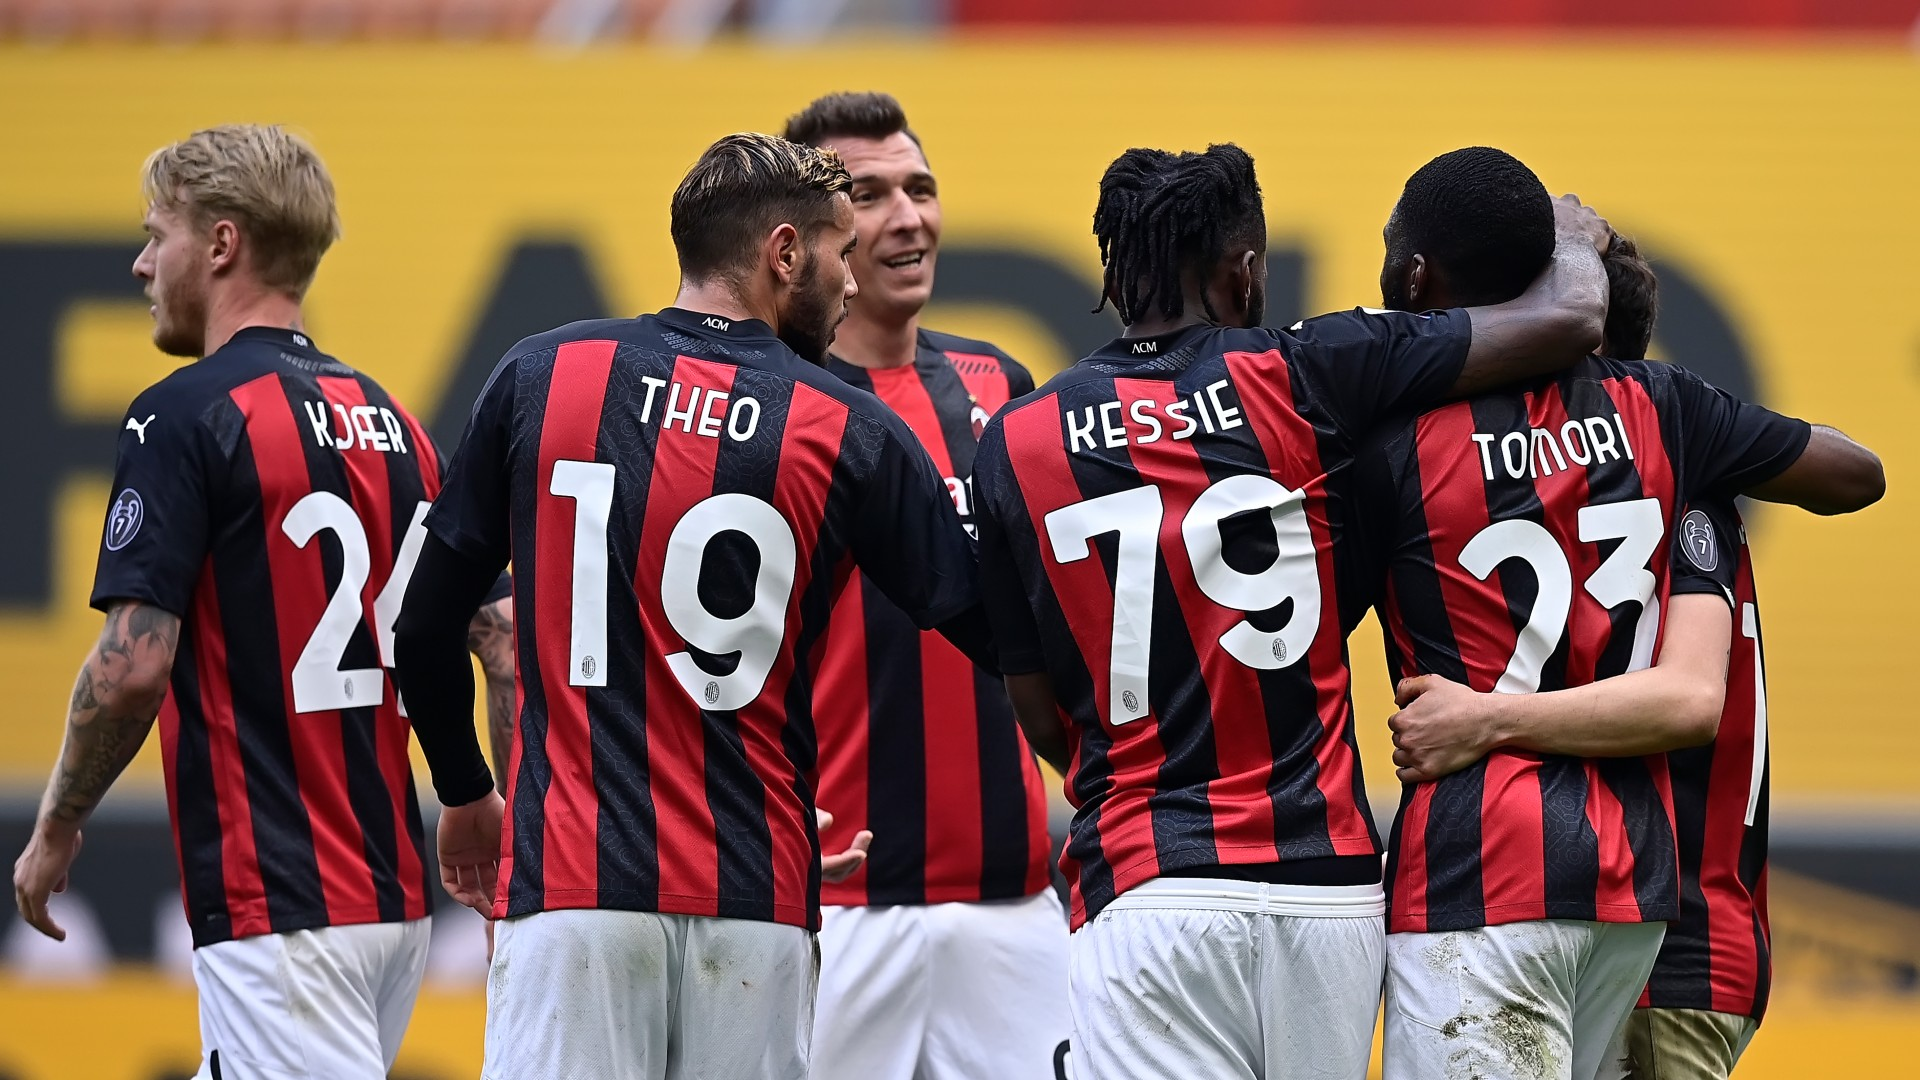 Milan 2-1 Genoa: Own goal keeps Rossoneri in the hunt